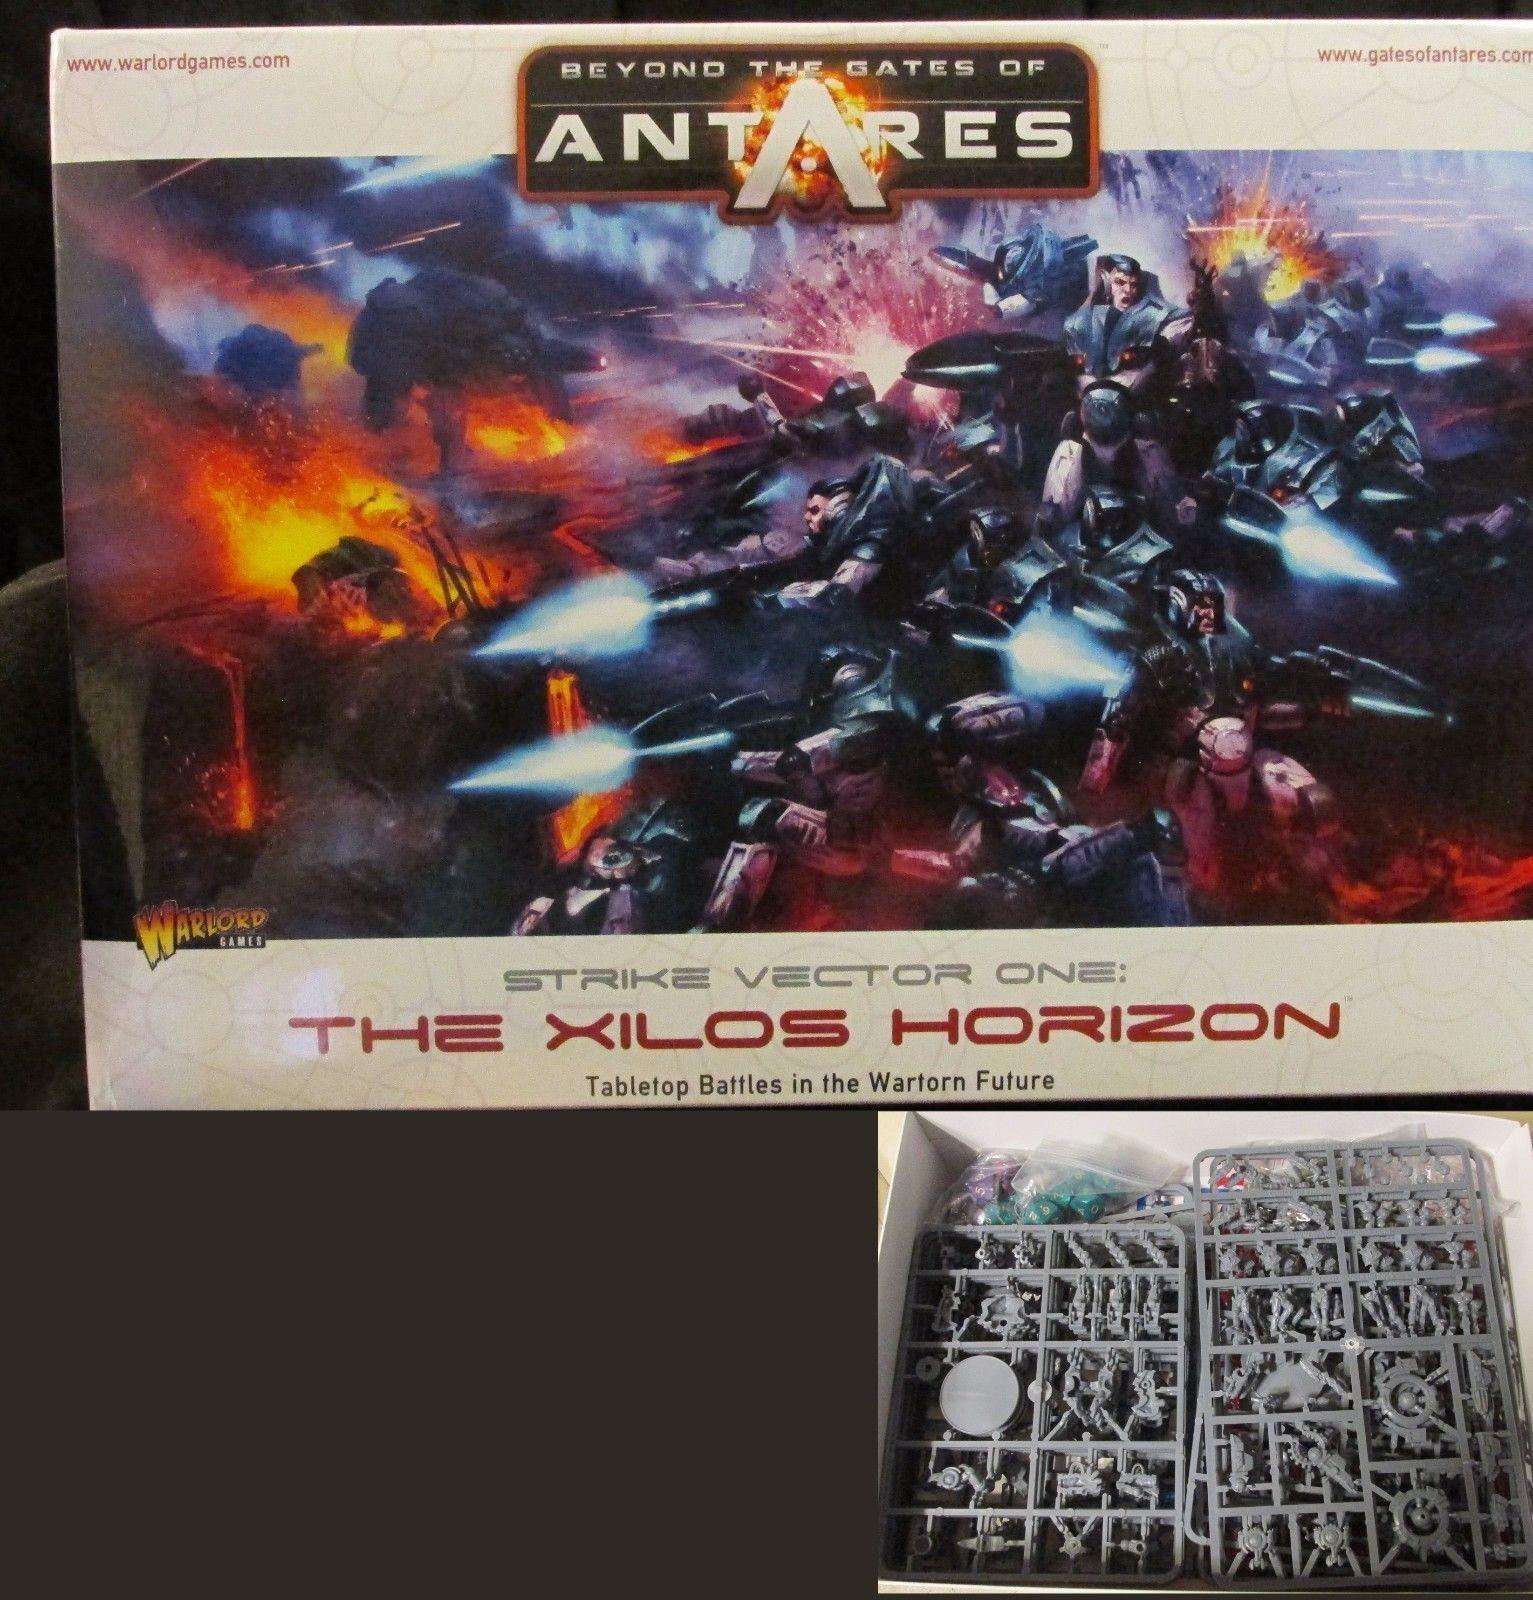 ANTARES - L'HORIZON XILOS XILOS XILOS - WARLORD 5e84f3